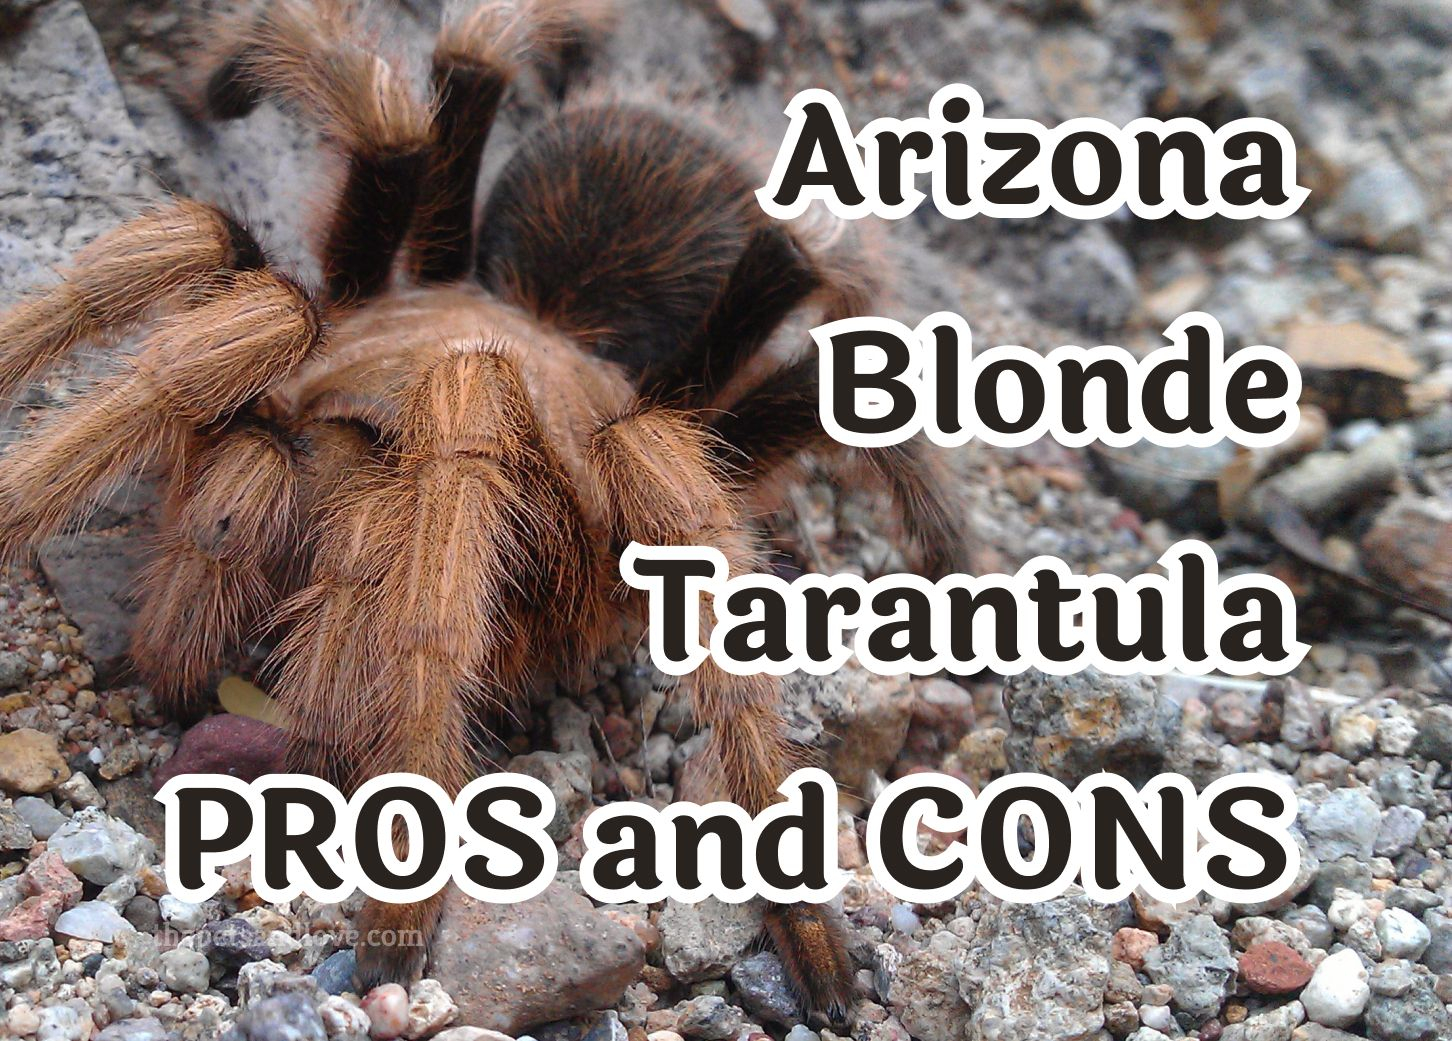 9 things to consider before buying an Arizona Blonde Tarantula pet